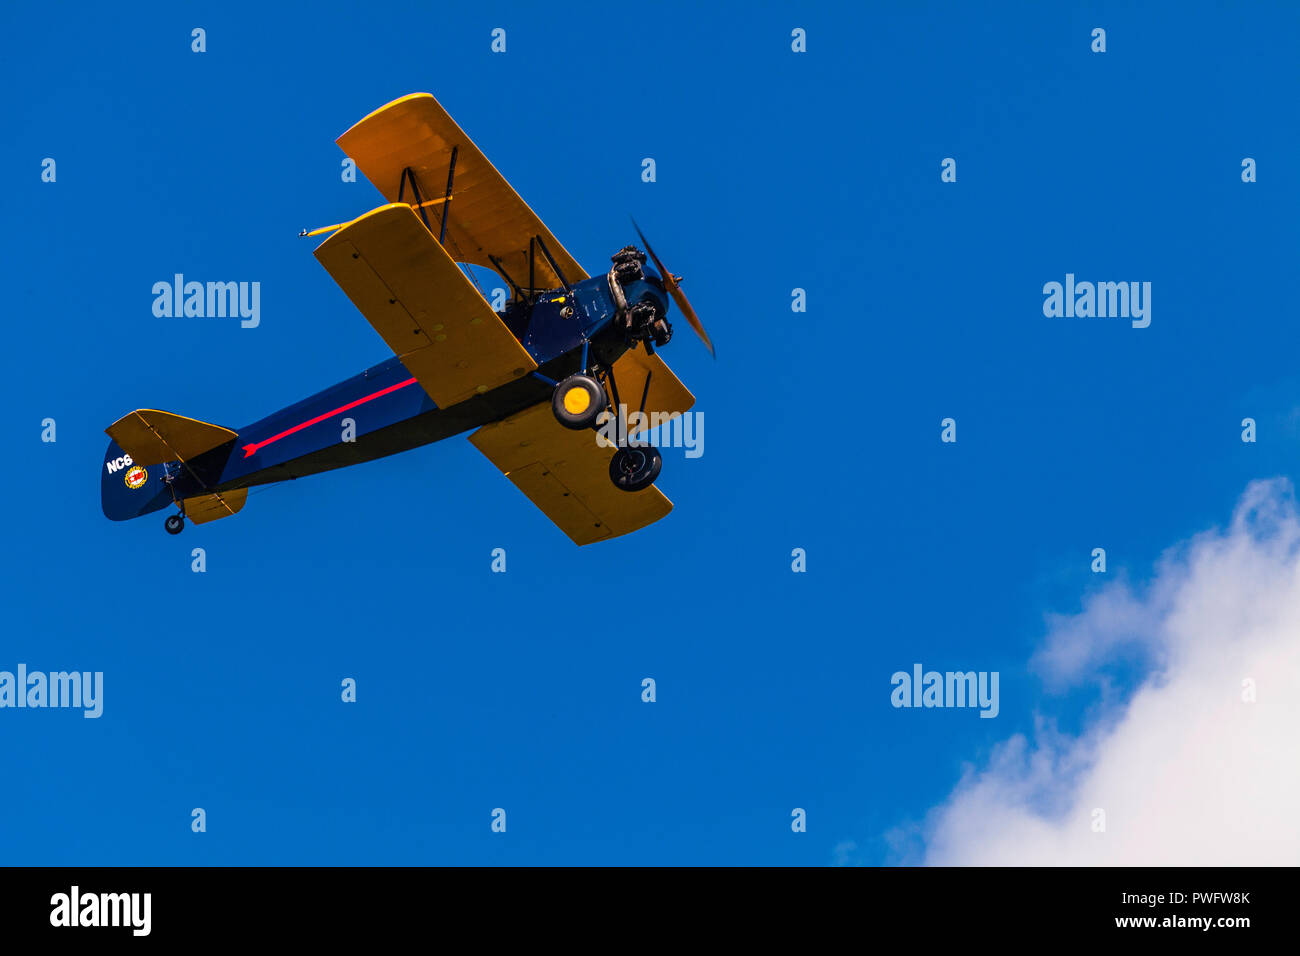 Old Rhinebeck Aerodrome _ Rhinebeck, New York, USA - Stock Image